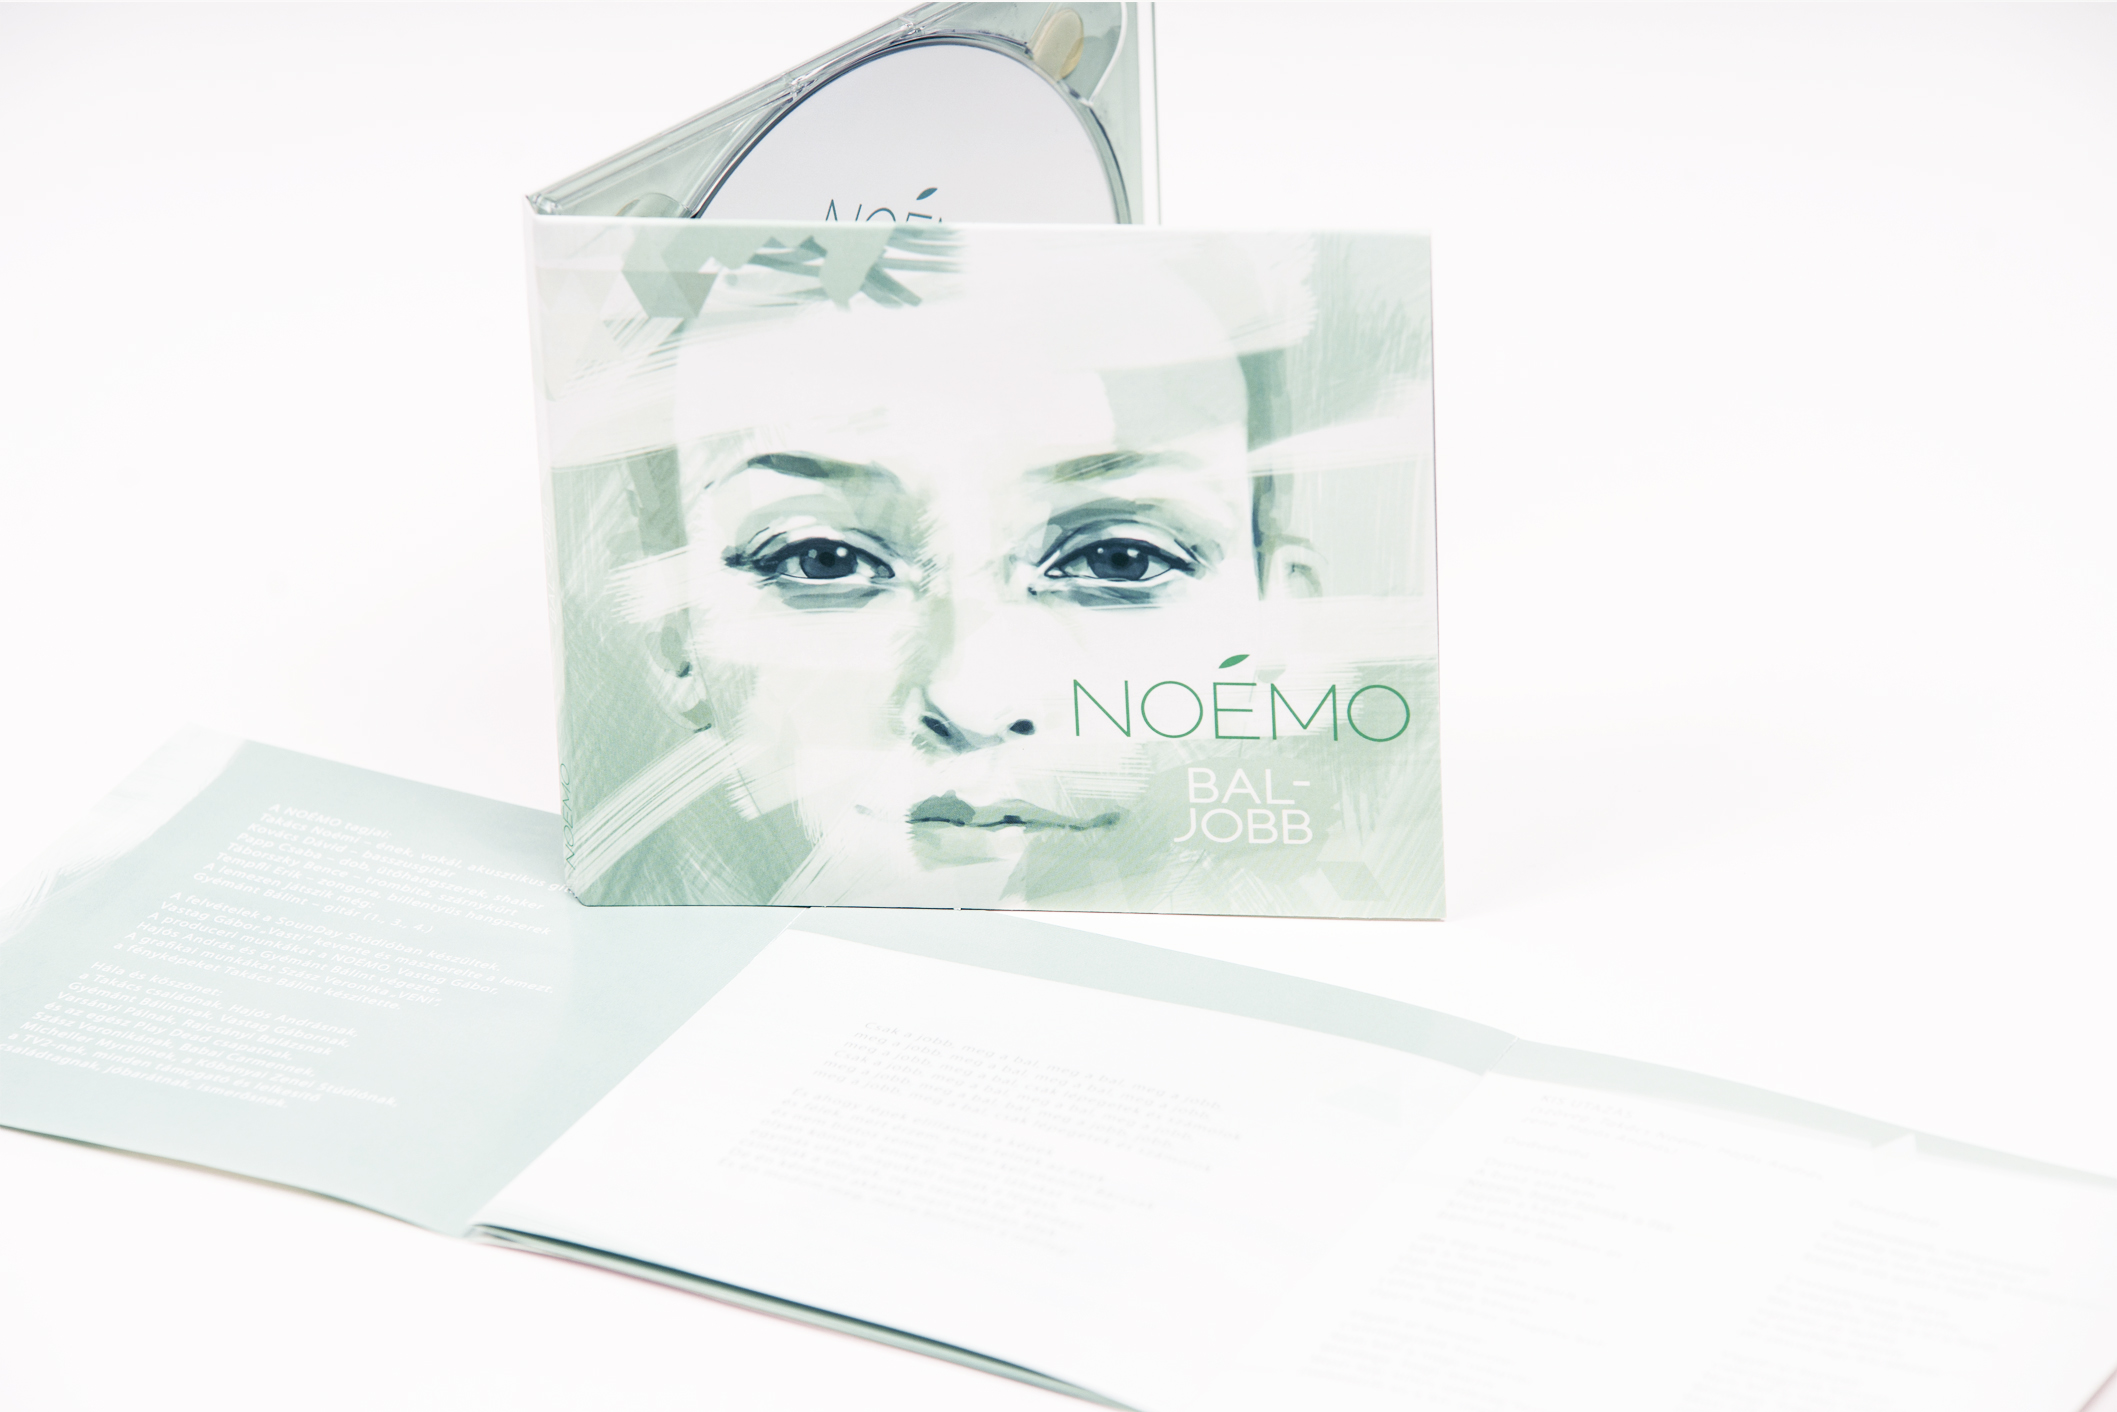 Noemo